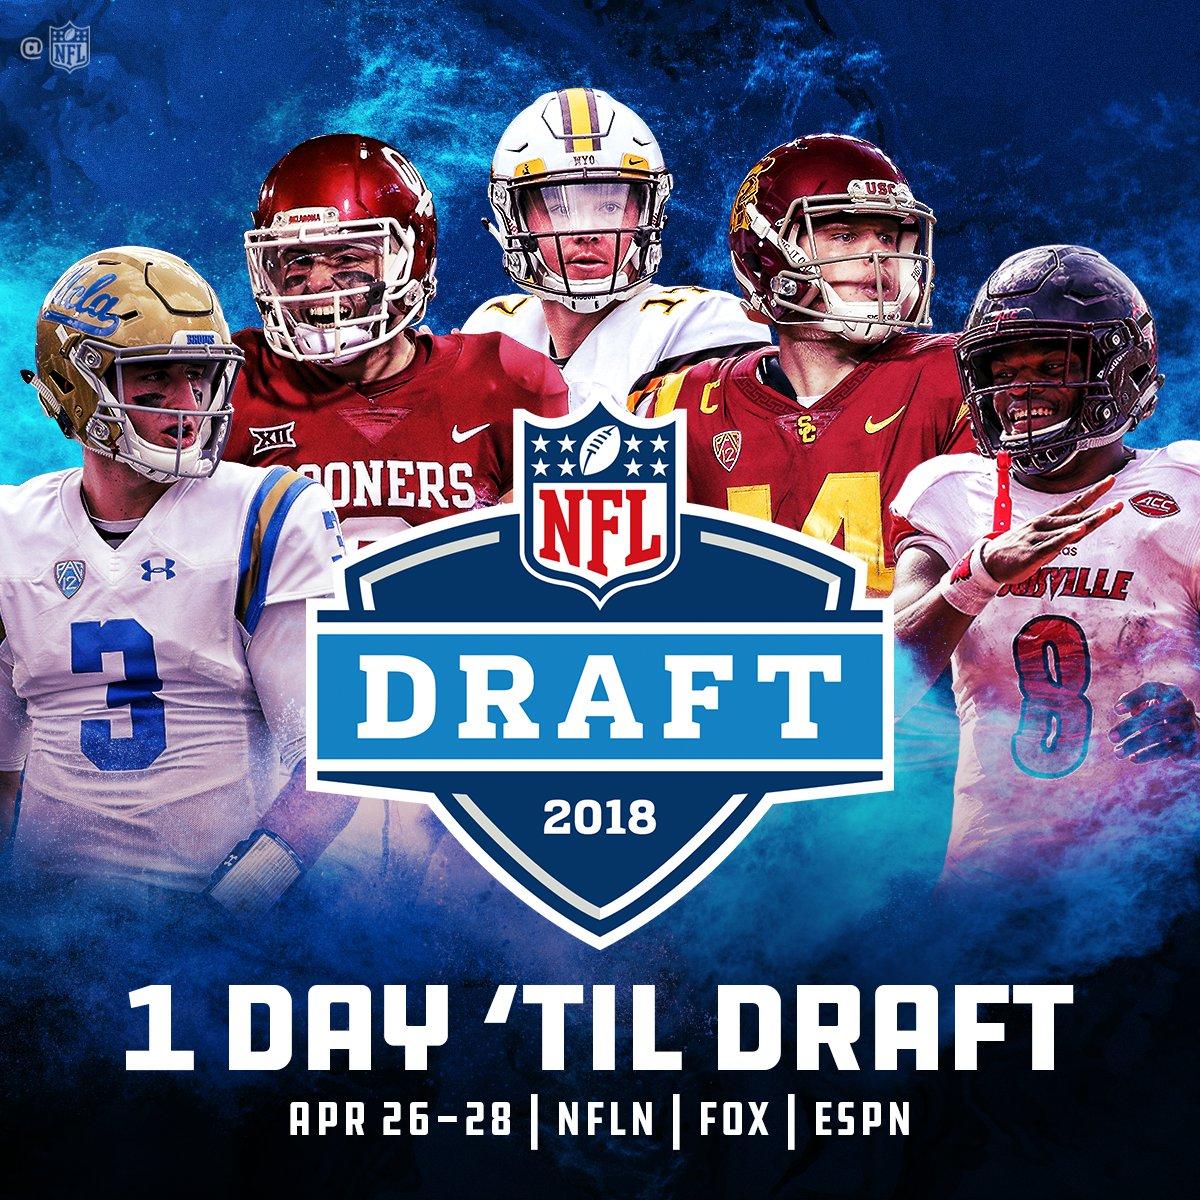 Only 24 hours until the @NFLDraft begins! ��  2018 #NFLDraft starts tomorrow on NFLN/FOX/ESPN https://t.co/YsScmjCKFc